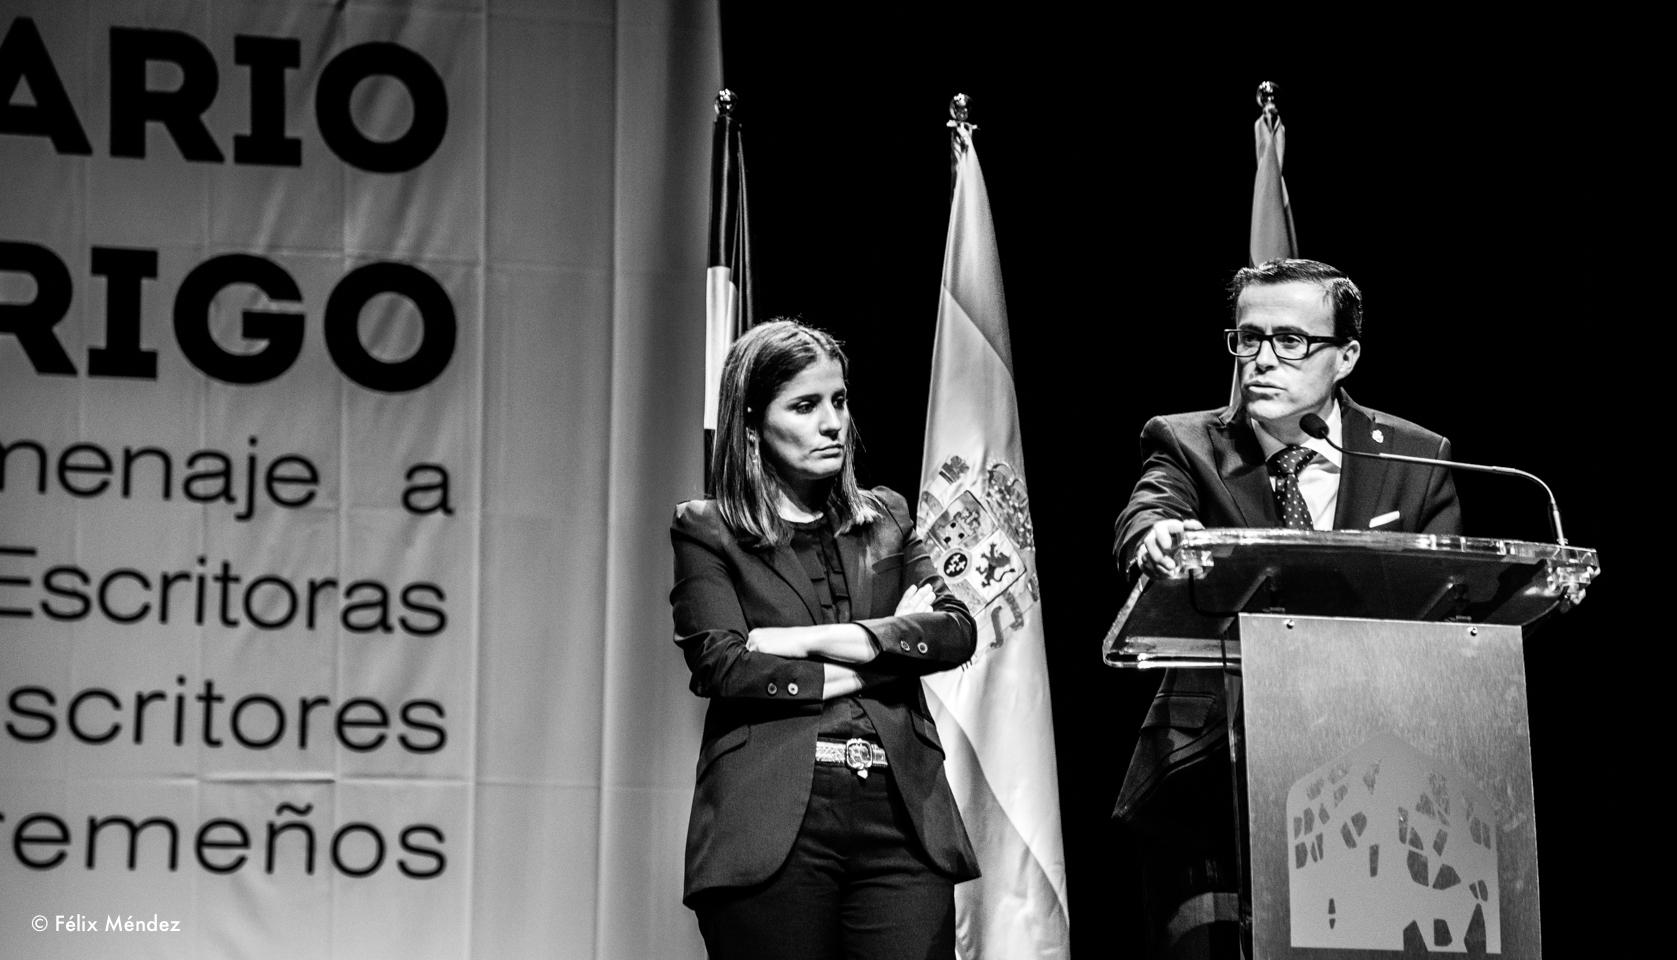 Felipe-trigo Premios15-culturabadajoz